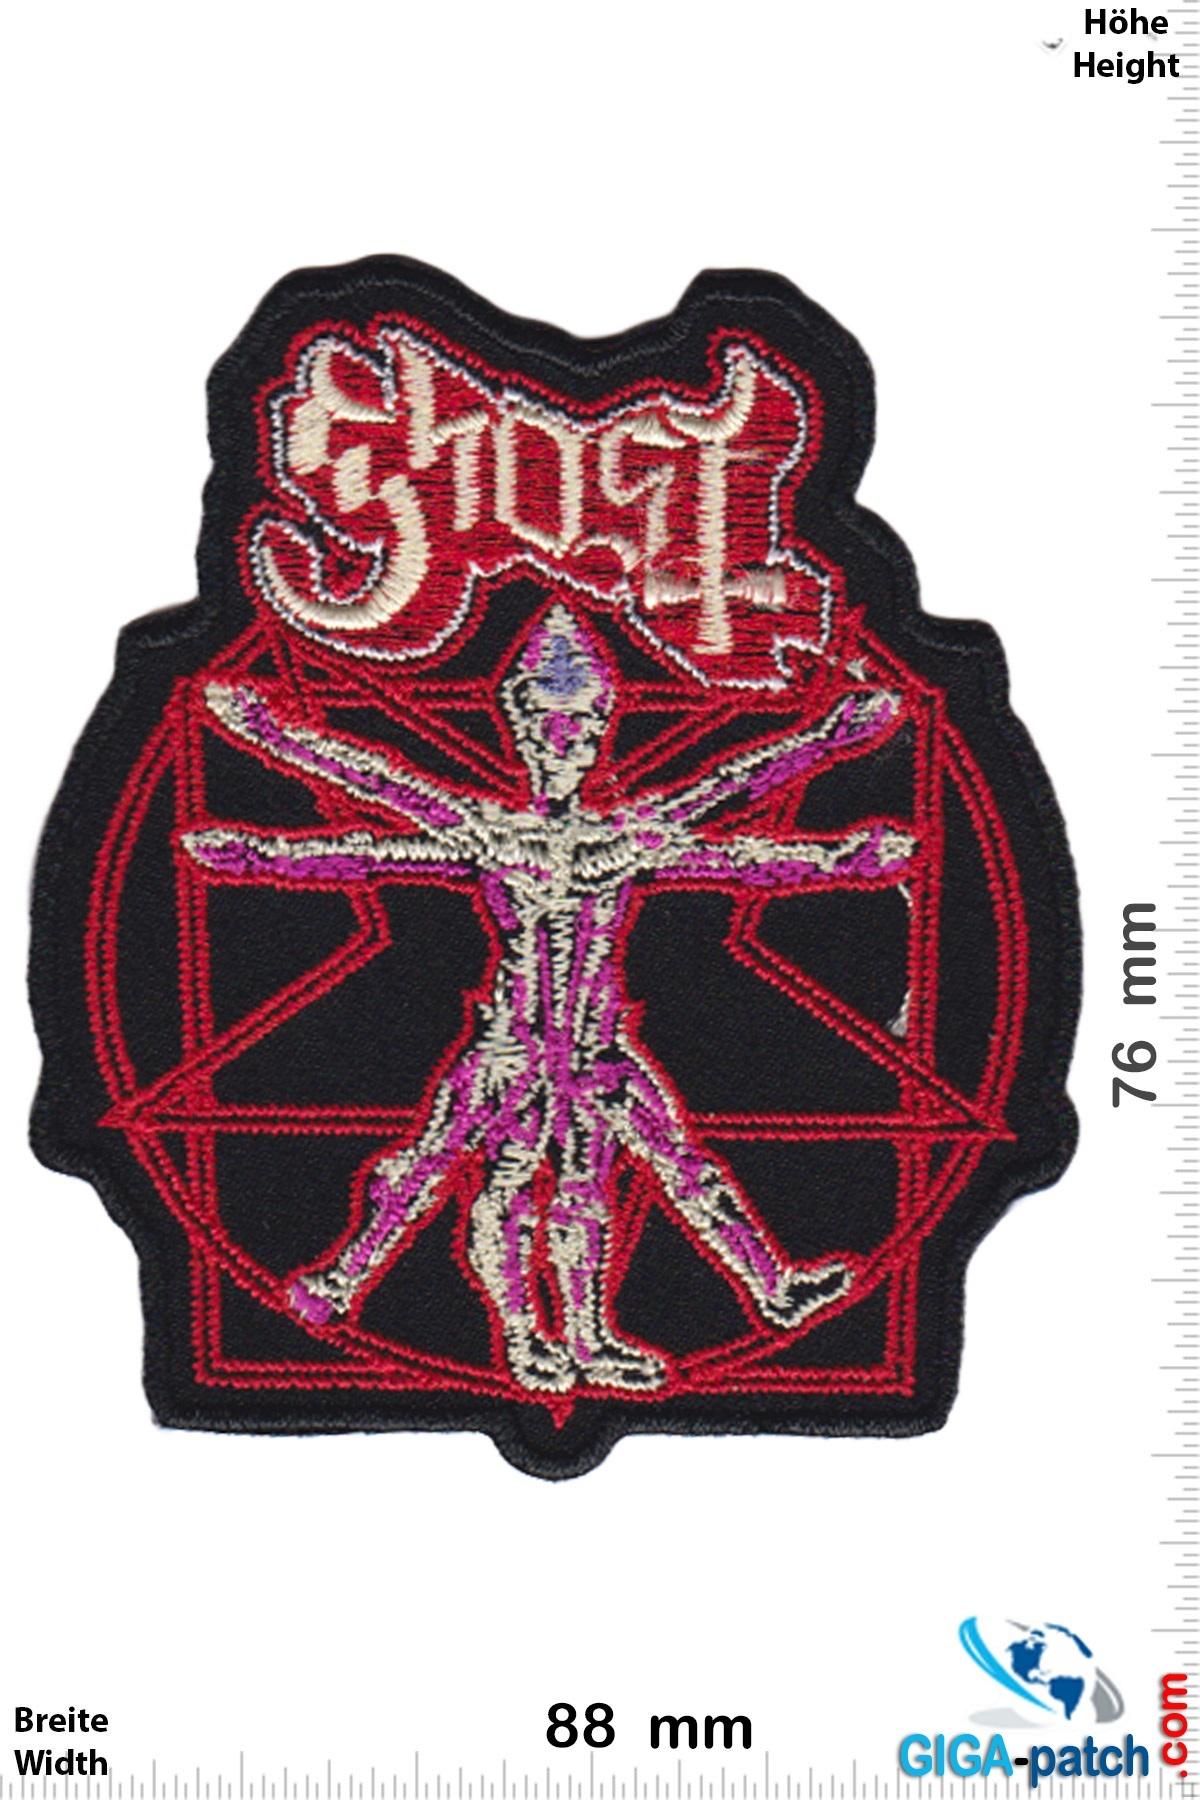 Ghost GHOST -The Vitruvian